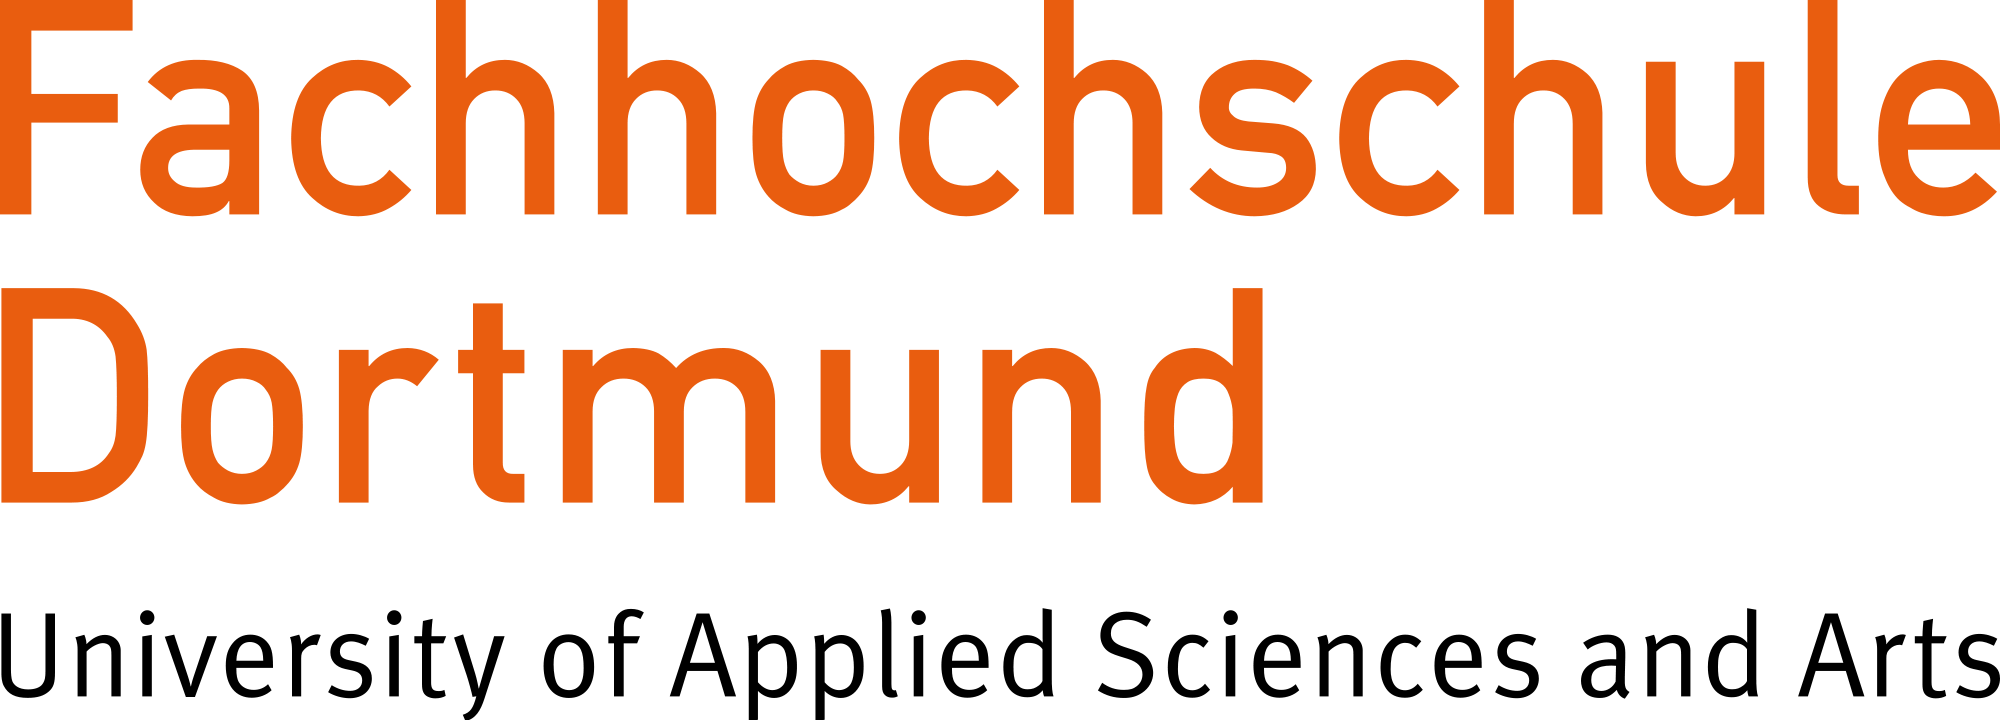 Informationsmanagement an der Fachhochschule Dortmund